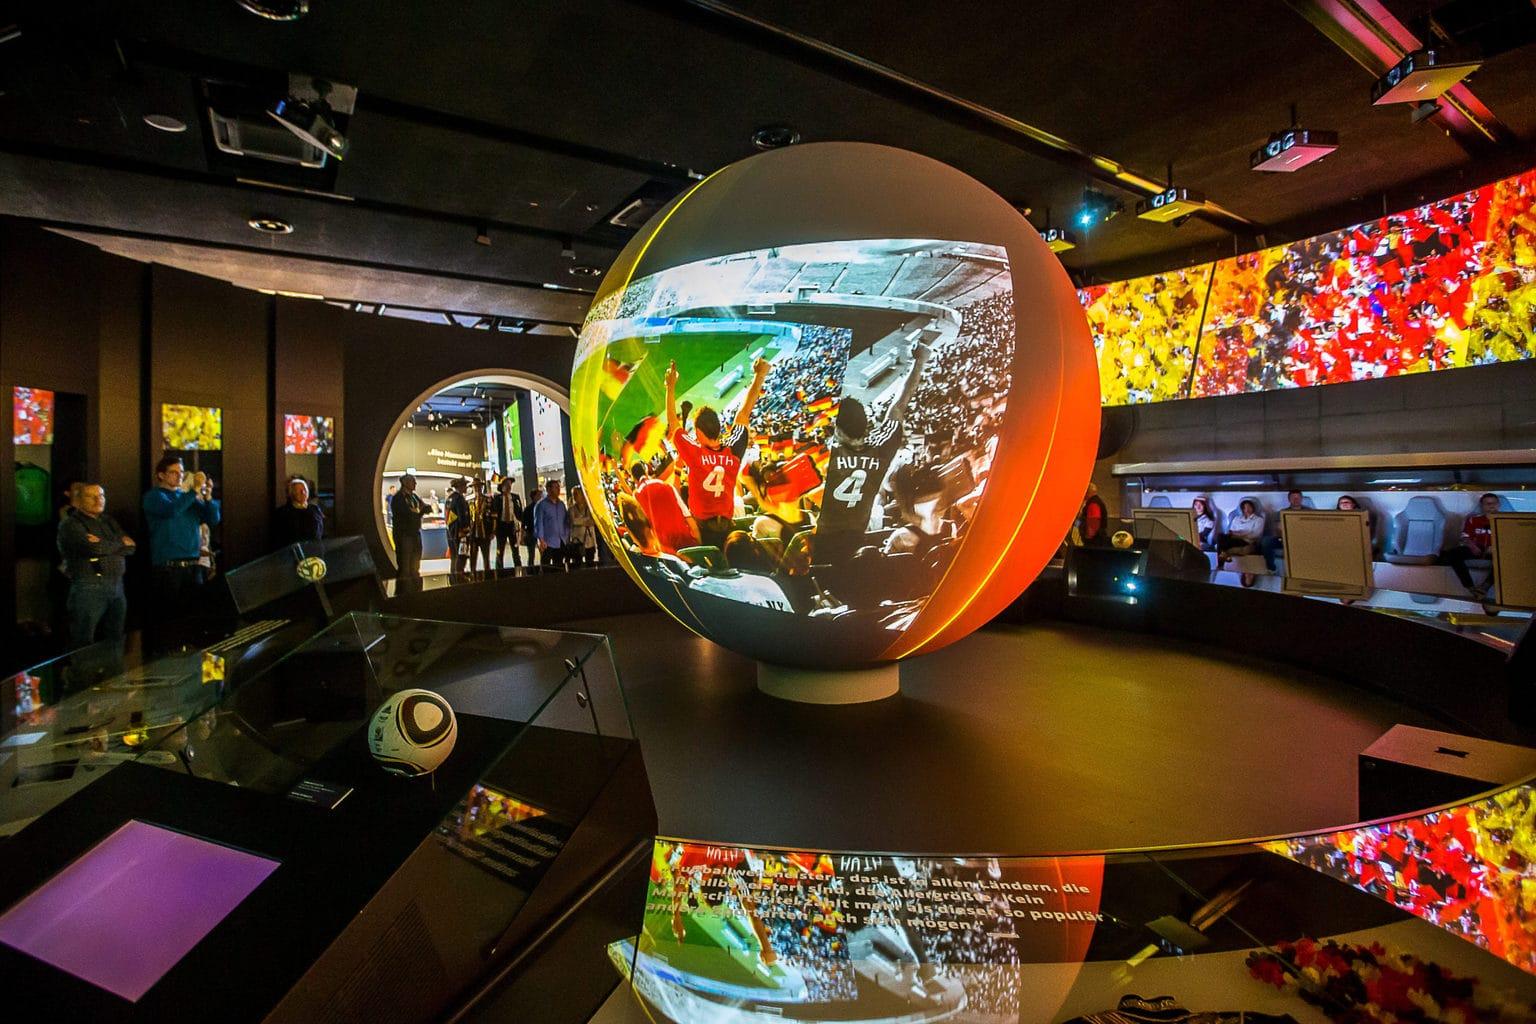 Multimedia display in het voetbalmuseum in Dortmund